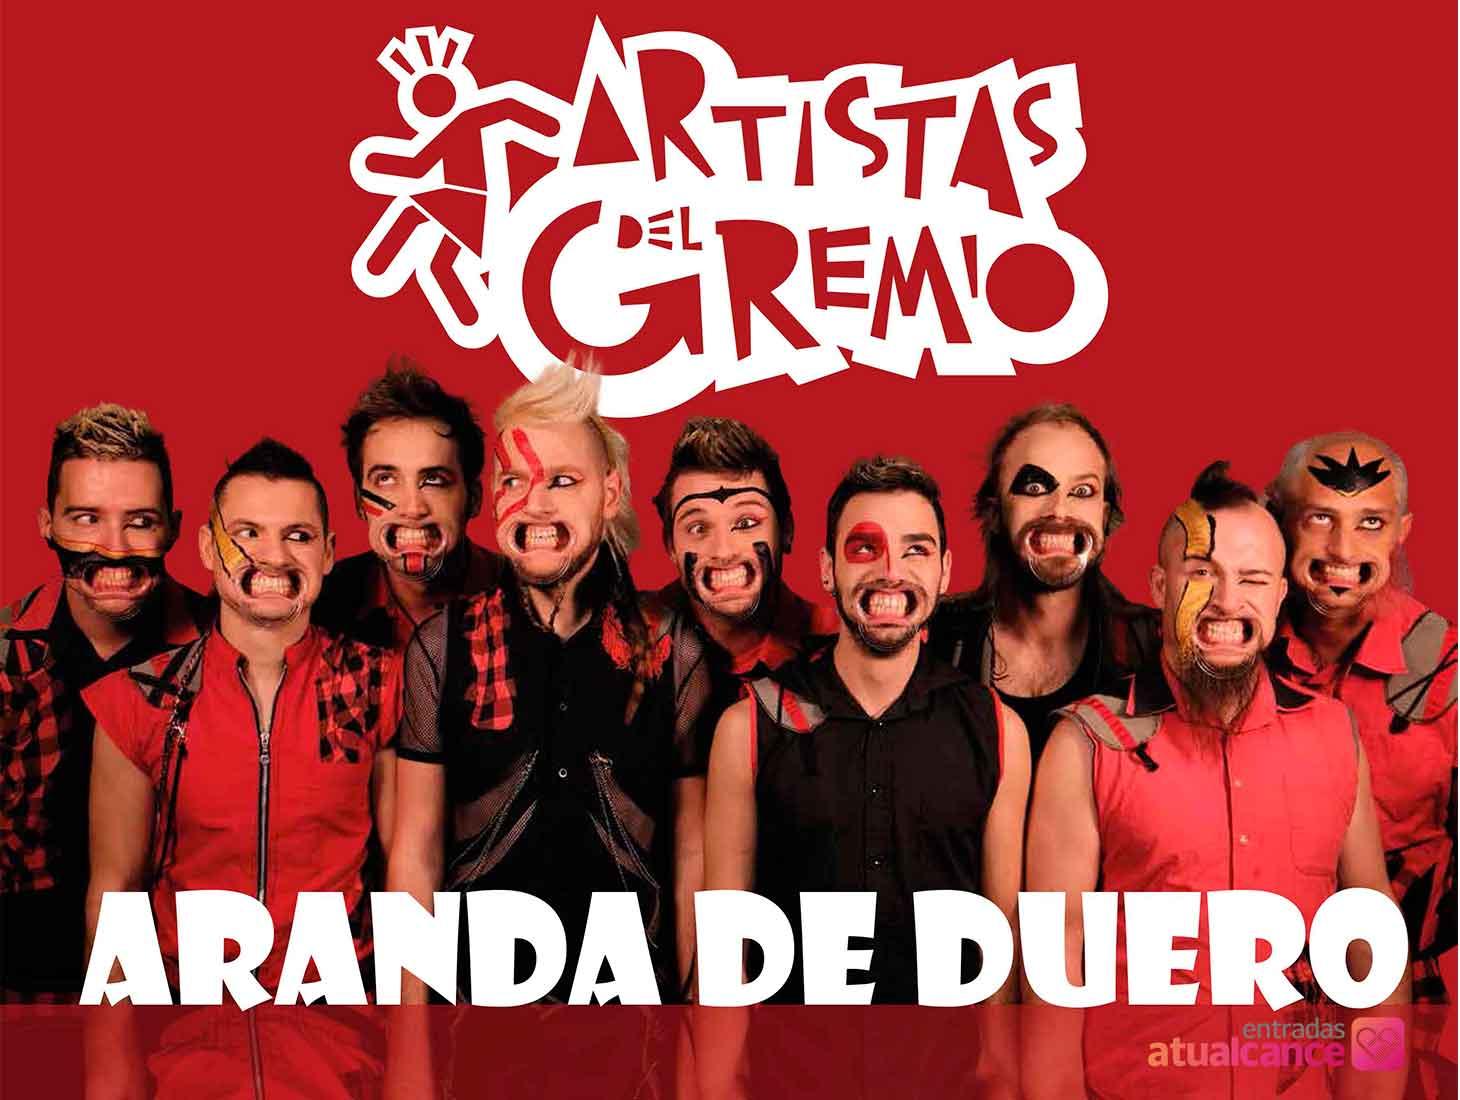 artistas-del-gremio-gps-burgos-5e1c60a2010c6.jpeg